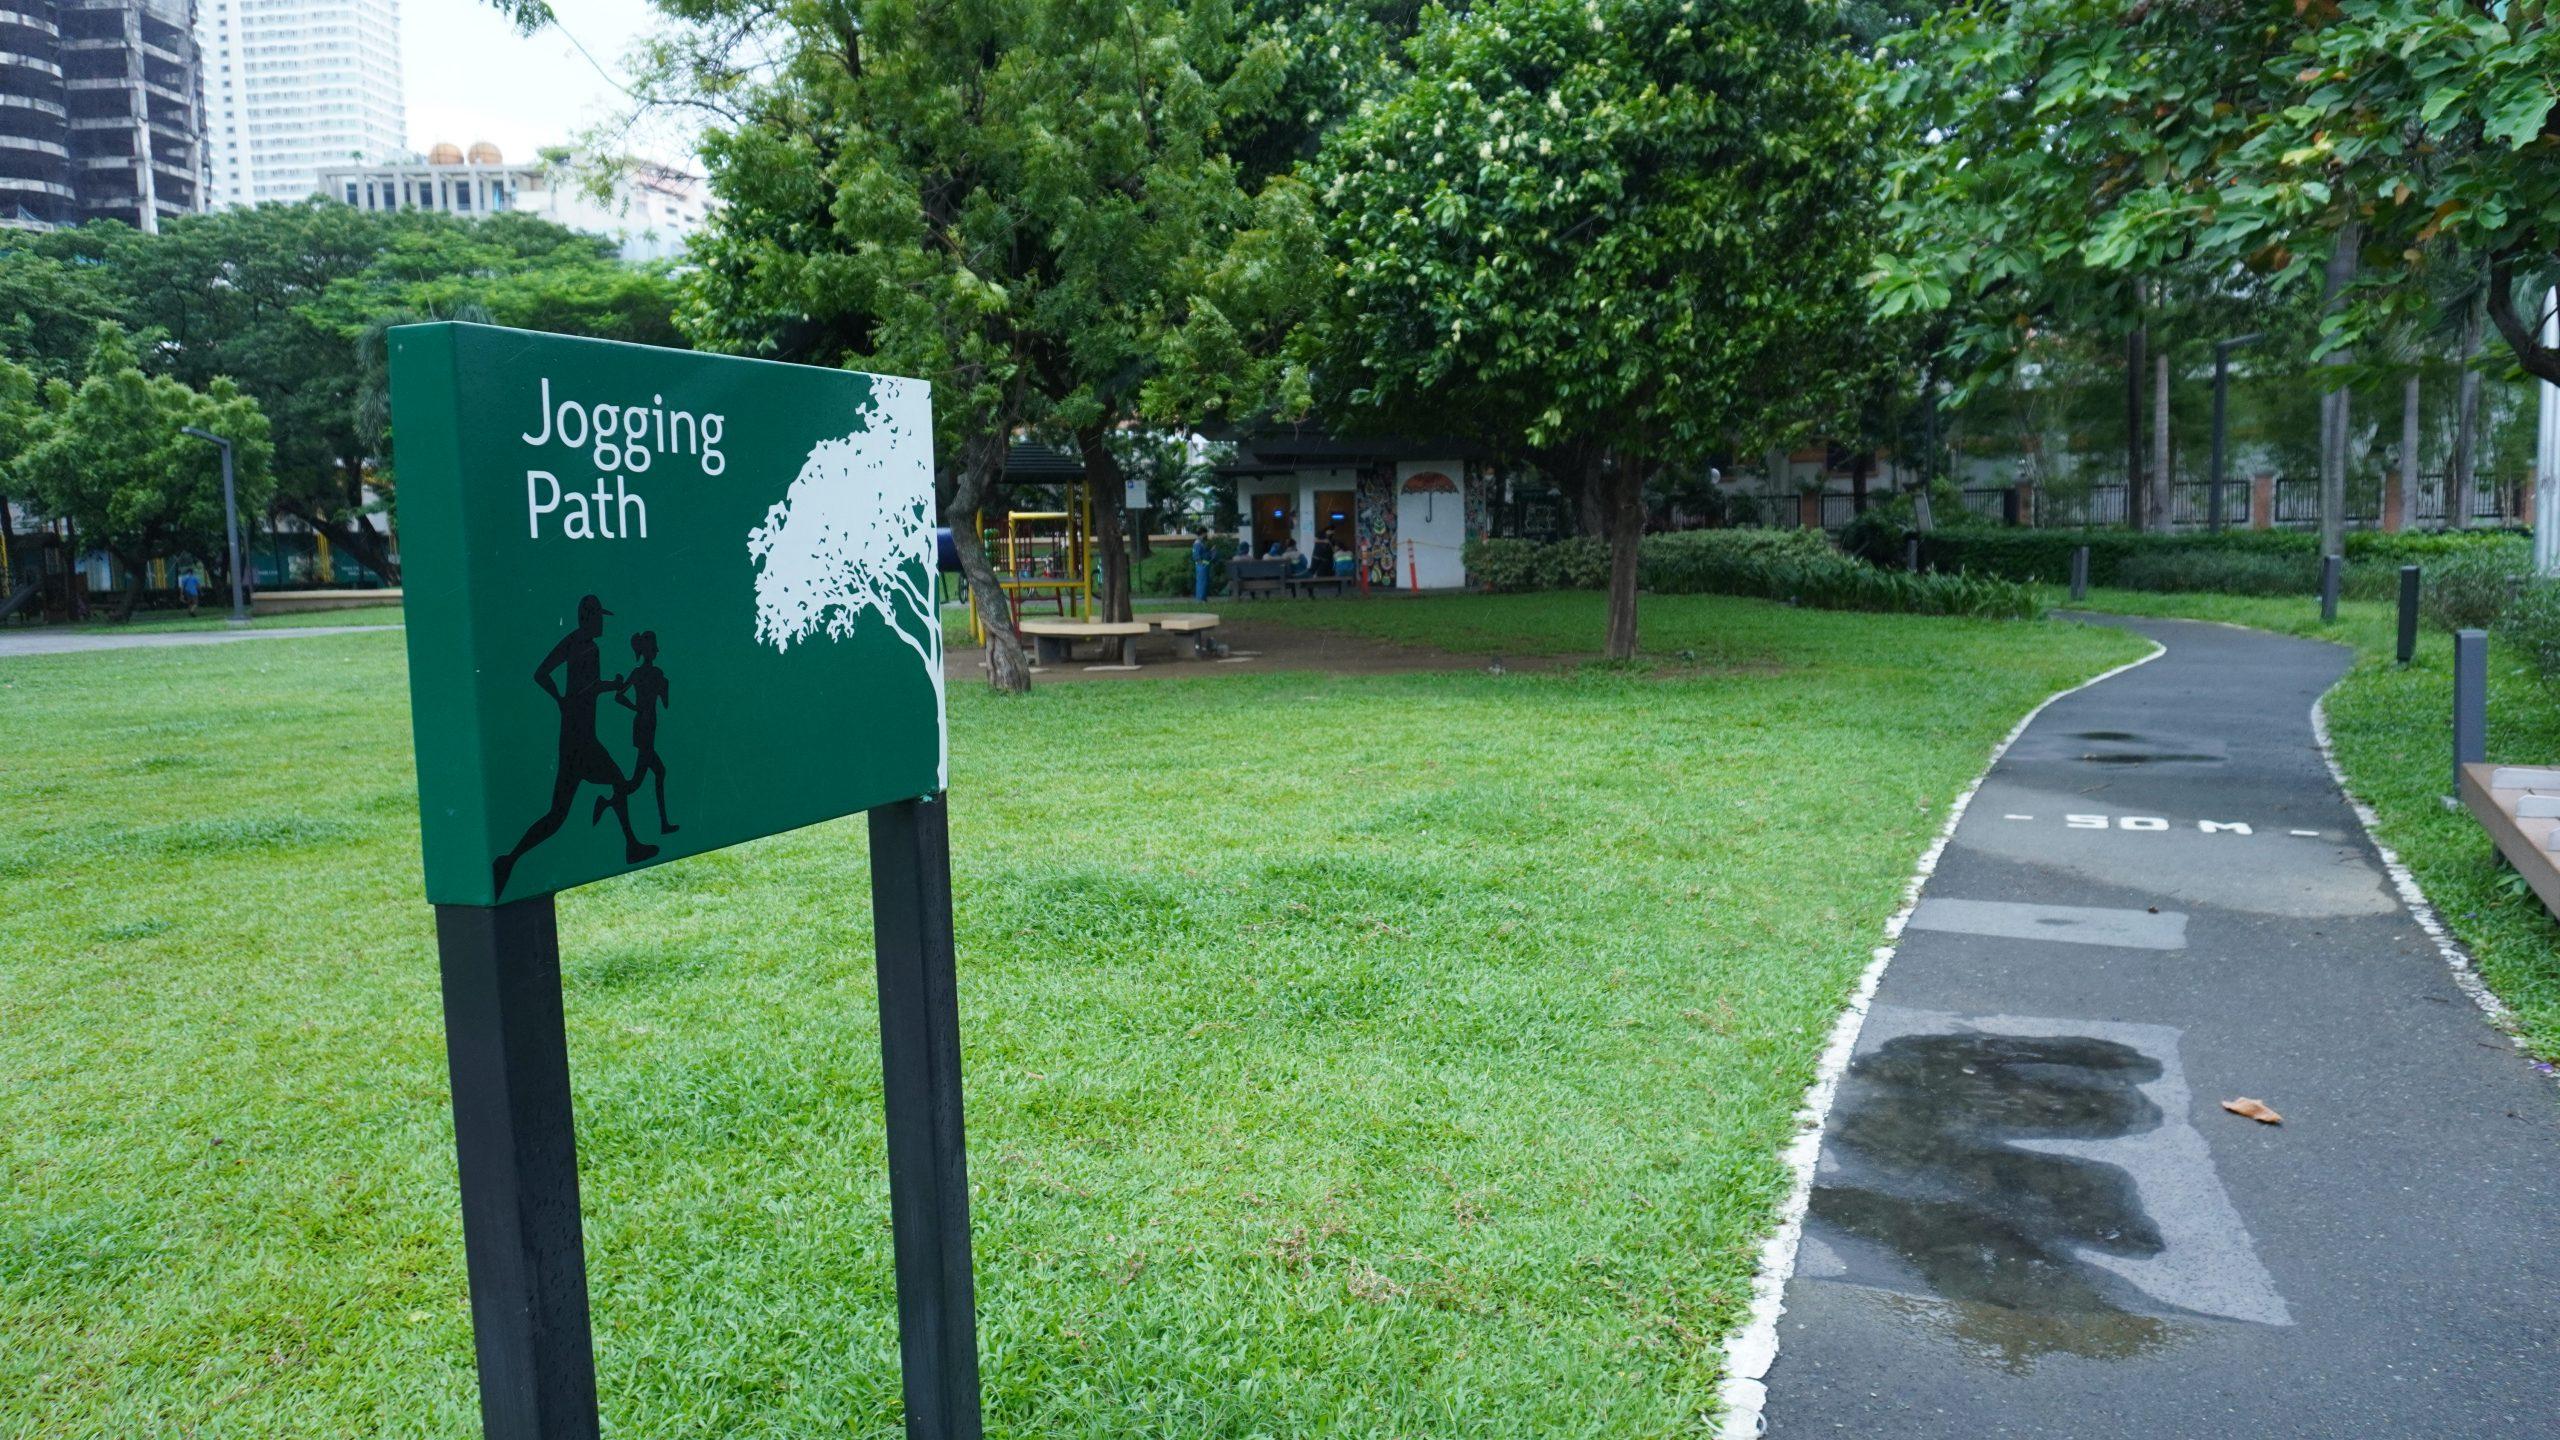 Jogging path Legazpi Park